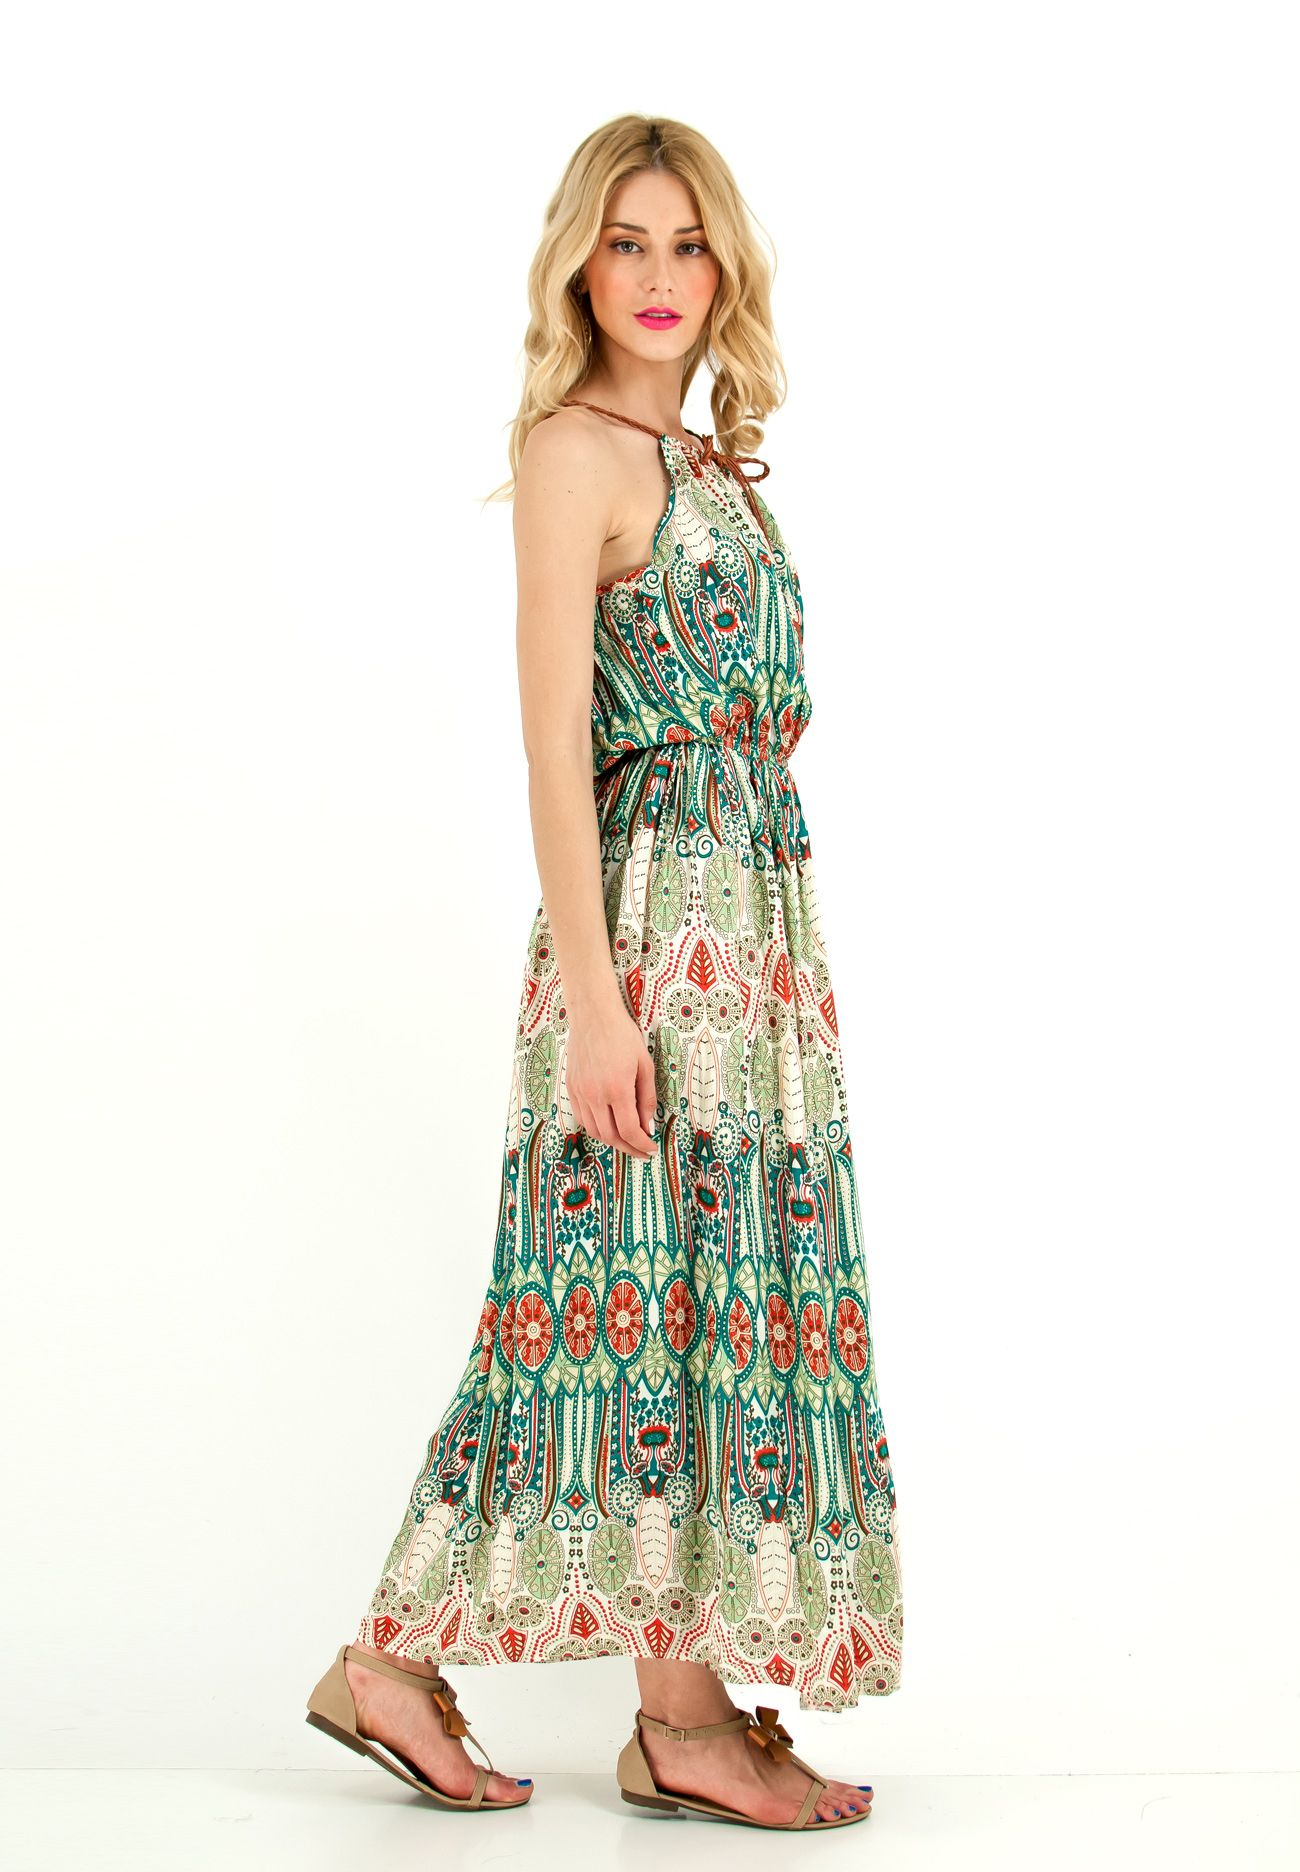 8a7cd7fa291 Μακρύ αμάνικο εμπριμέ φόρεμα με δερμάτινες λεπτές τιράντες και ...